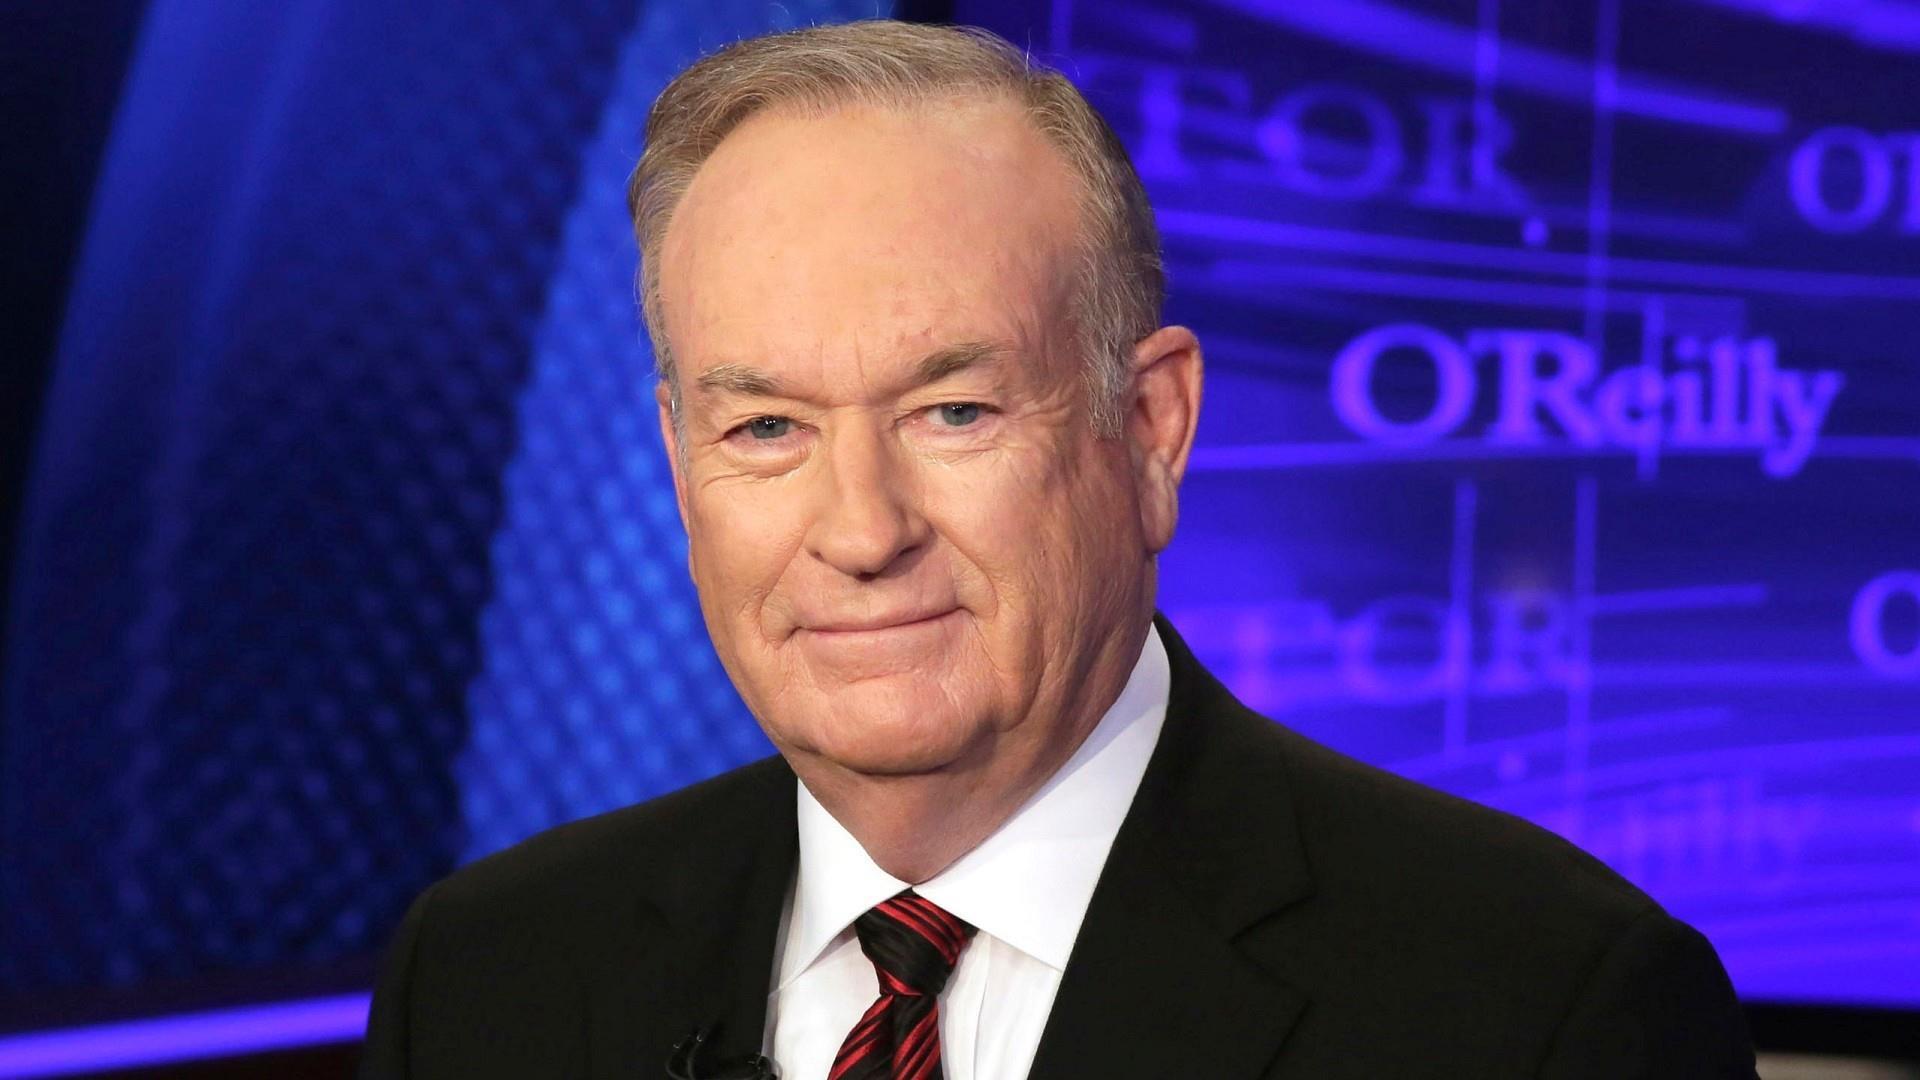 $32 O'Reilly settlement raises eyebrows...